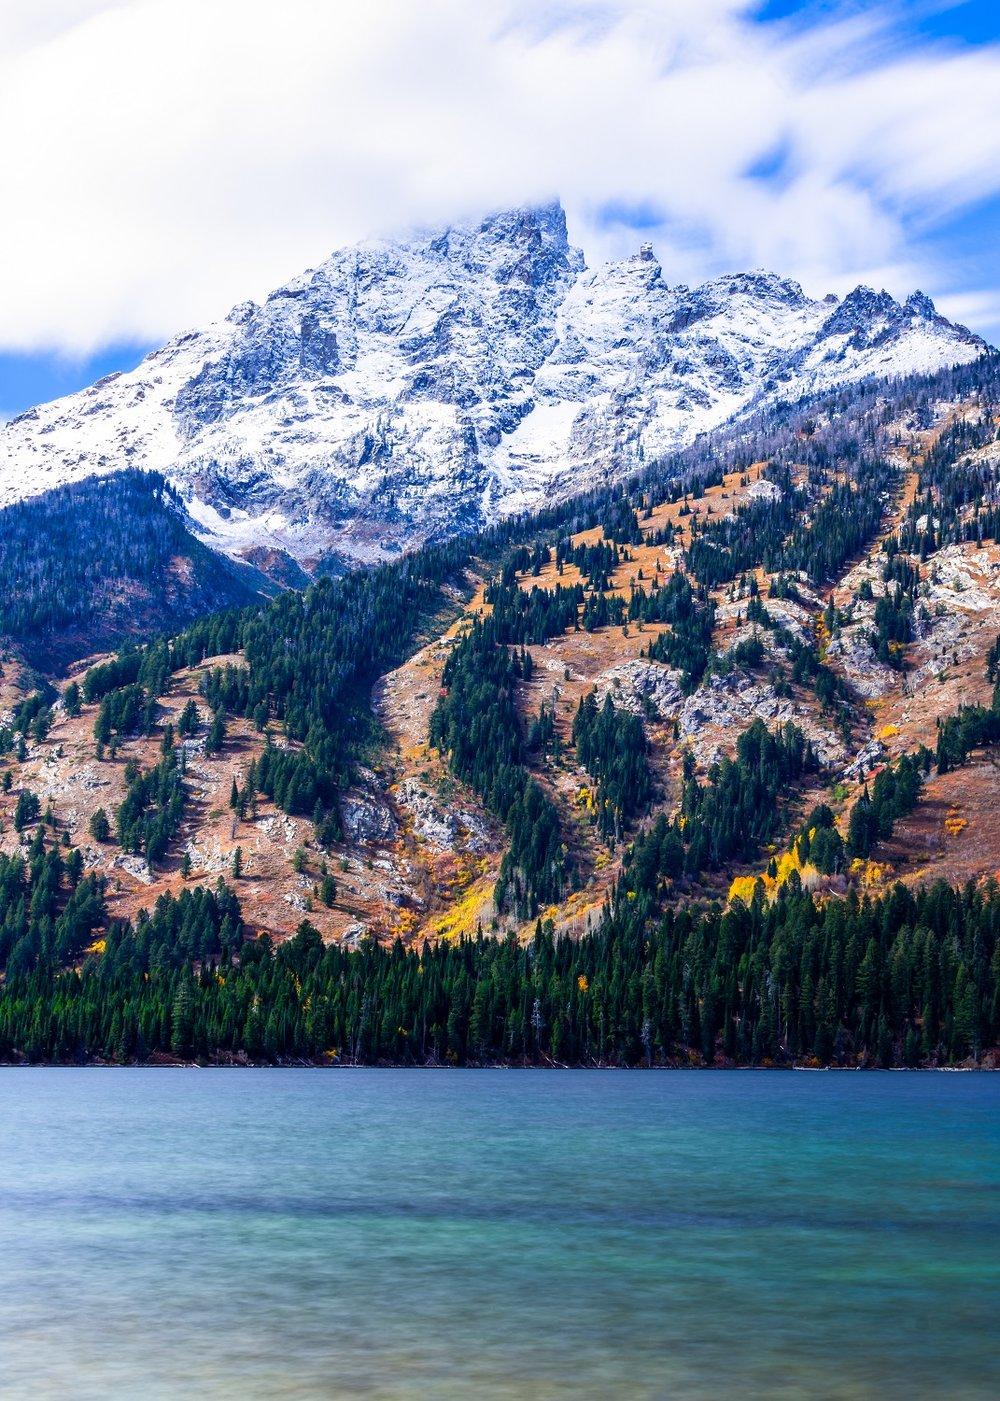 """Introspection"" - Grand Teton from across Jenny Lake."